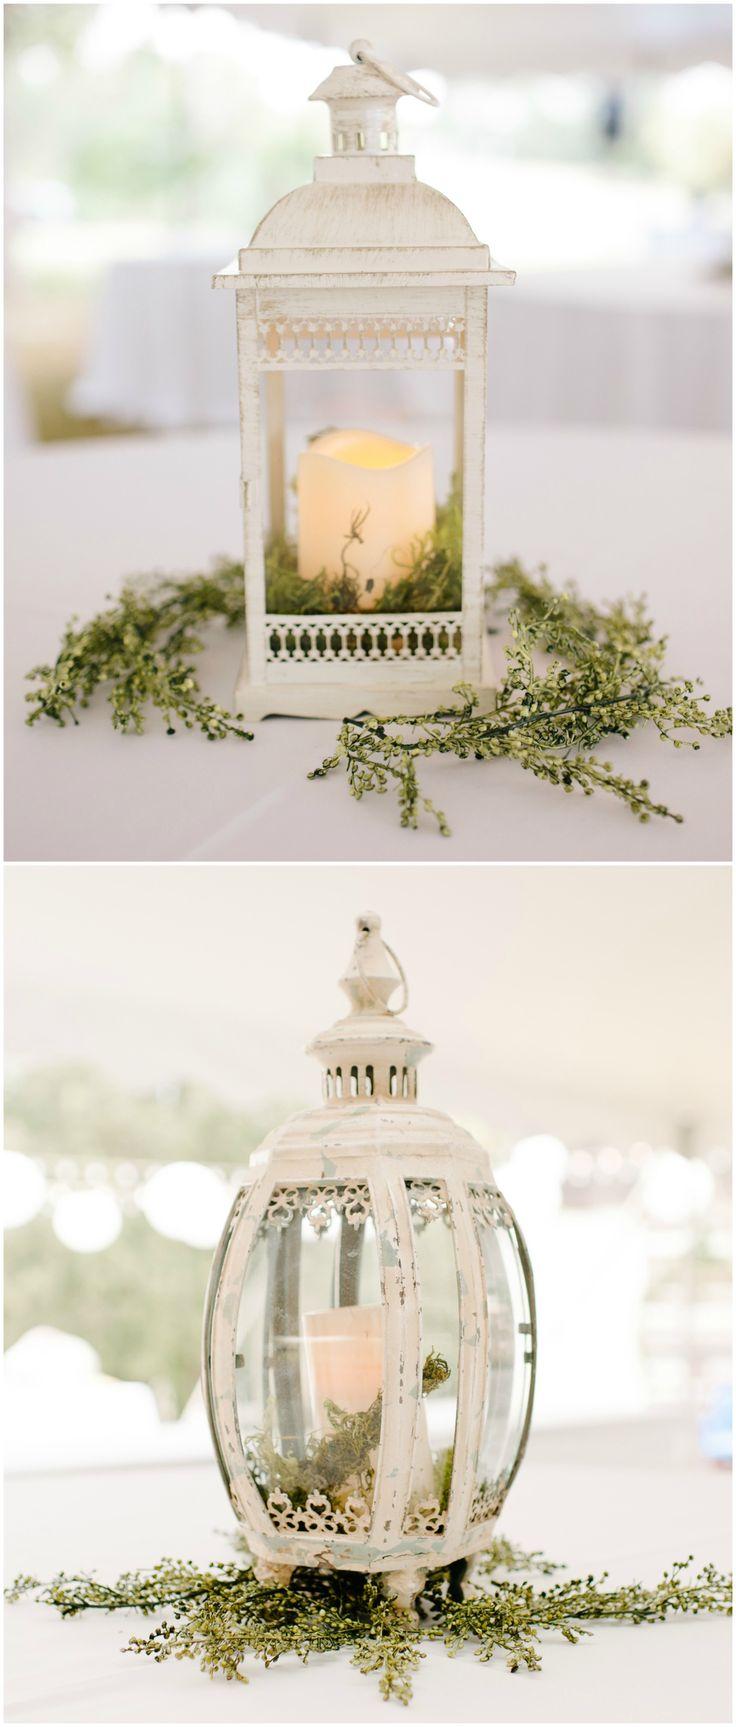 210 best Vintage Weddings images on Pinterest   Retro weddings ...